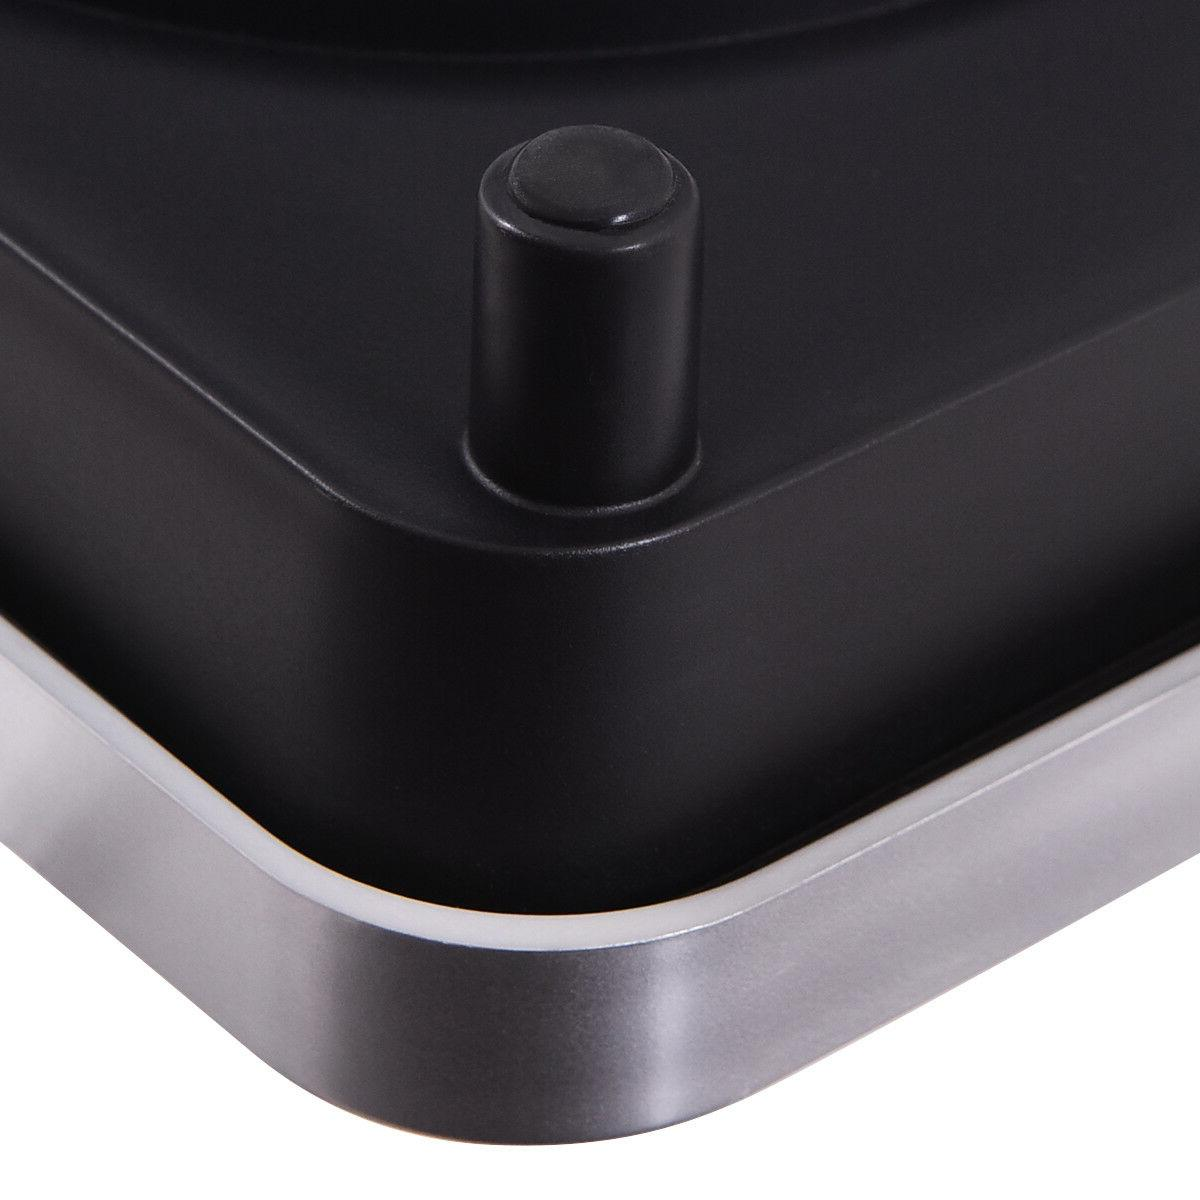 Electric Cooker Burner Digital Cooktop Countertop